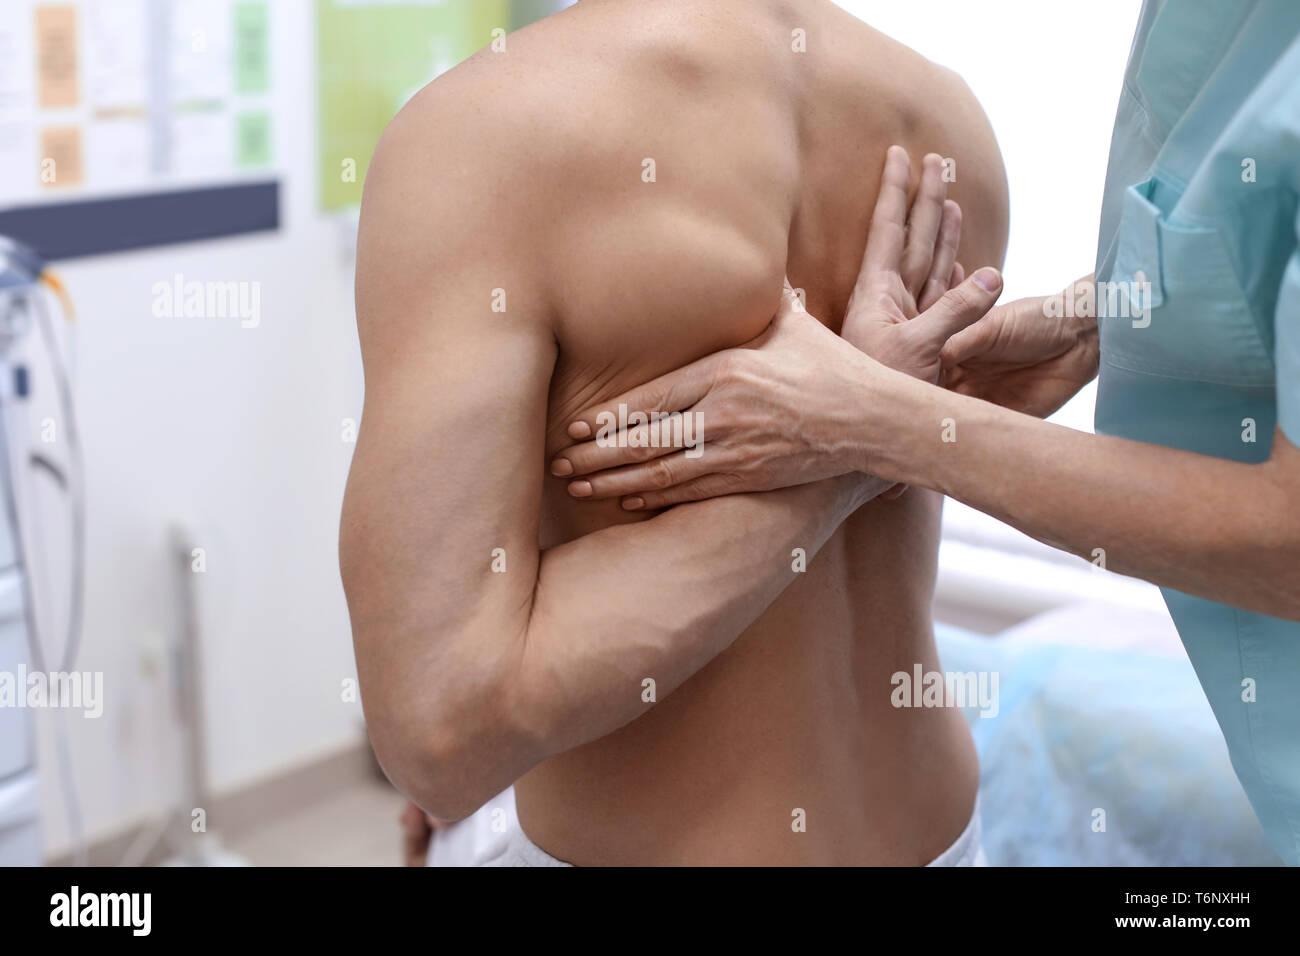 Orthopedist examining patient in hospital - Stock Image